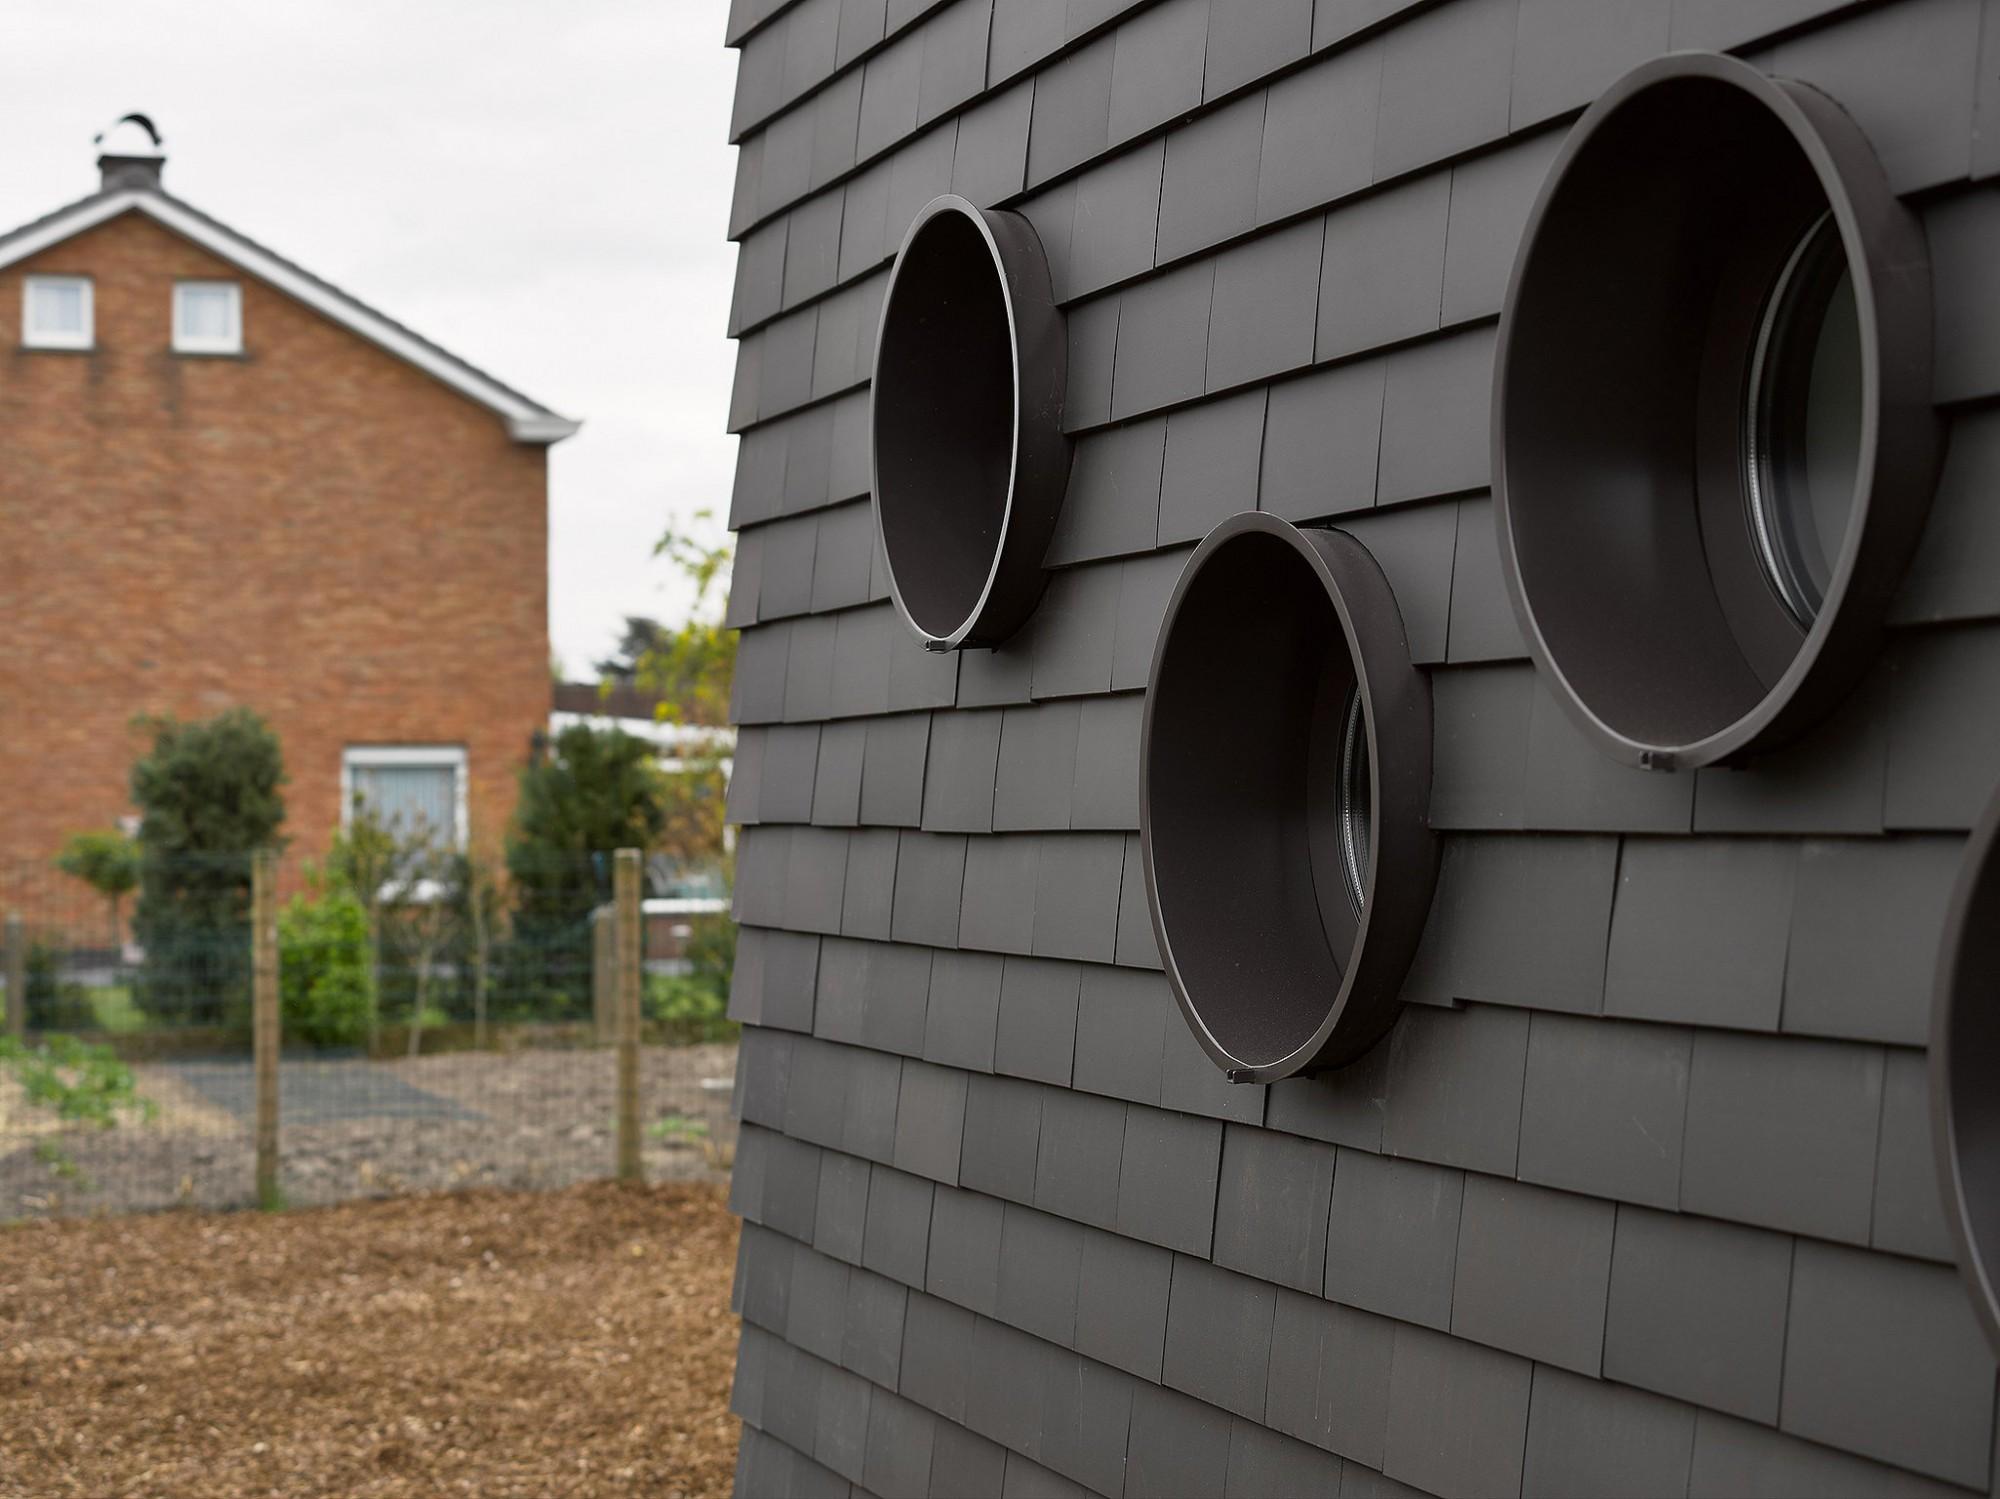 Afbeelding: Architectuur fotografie, detail woning Wondelgem, voor atelier M Architects + Planners.